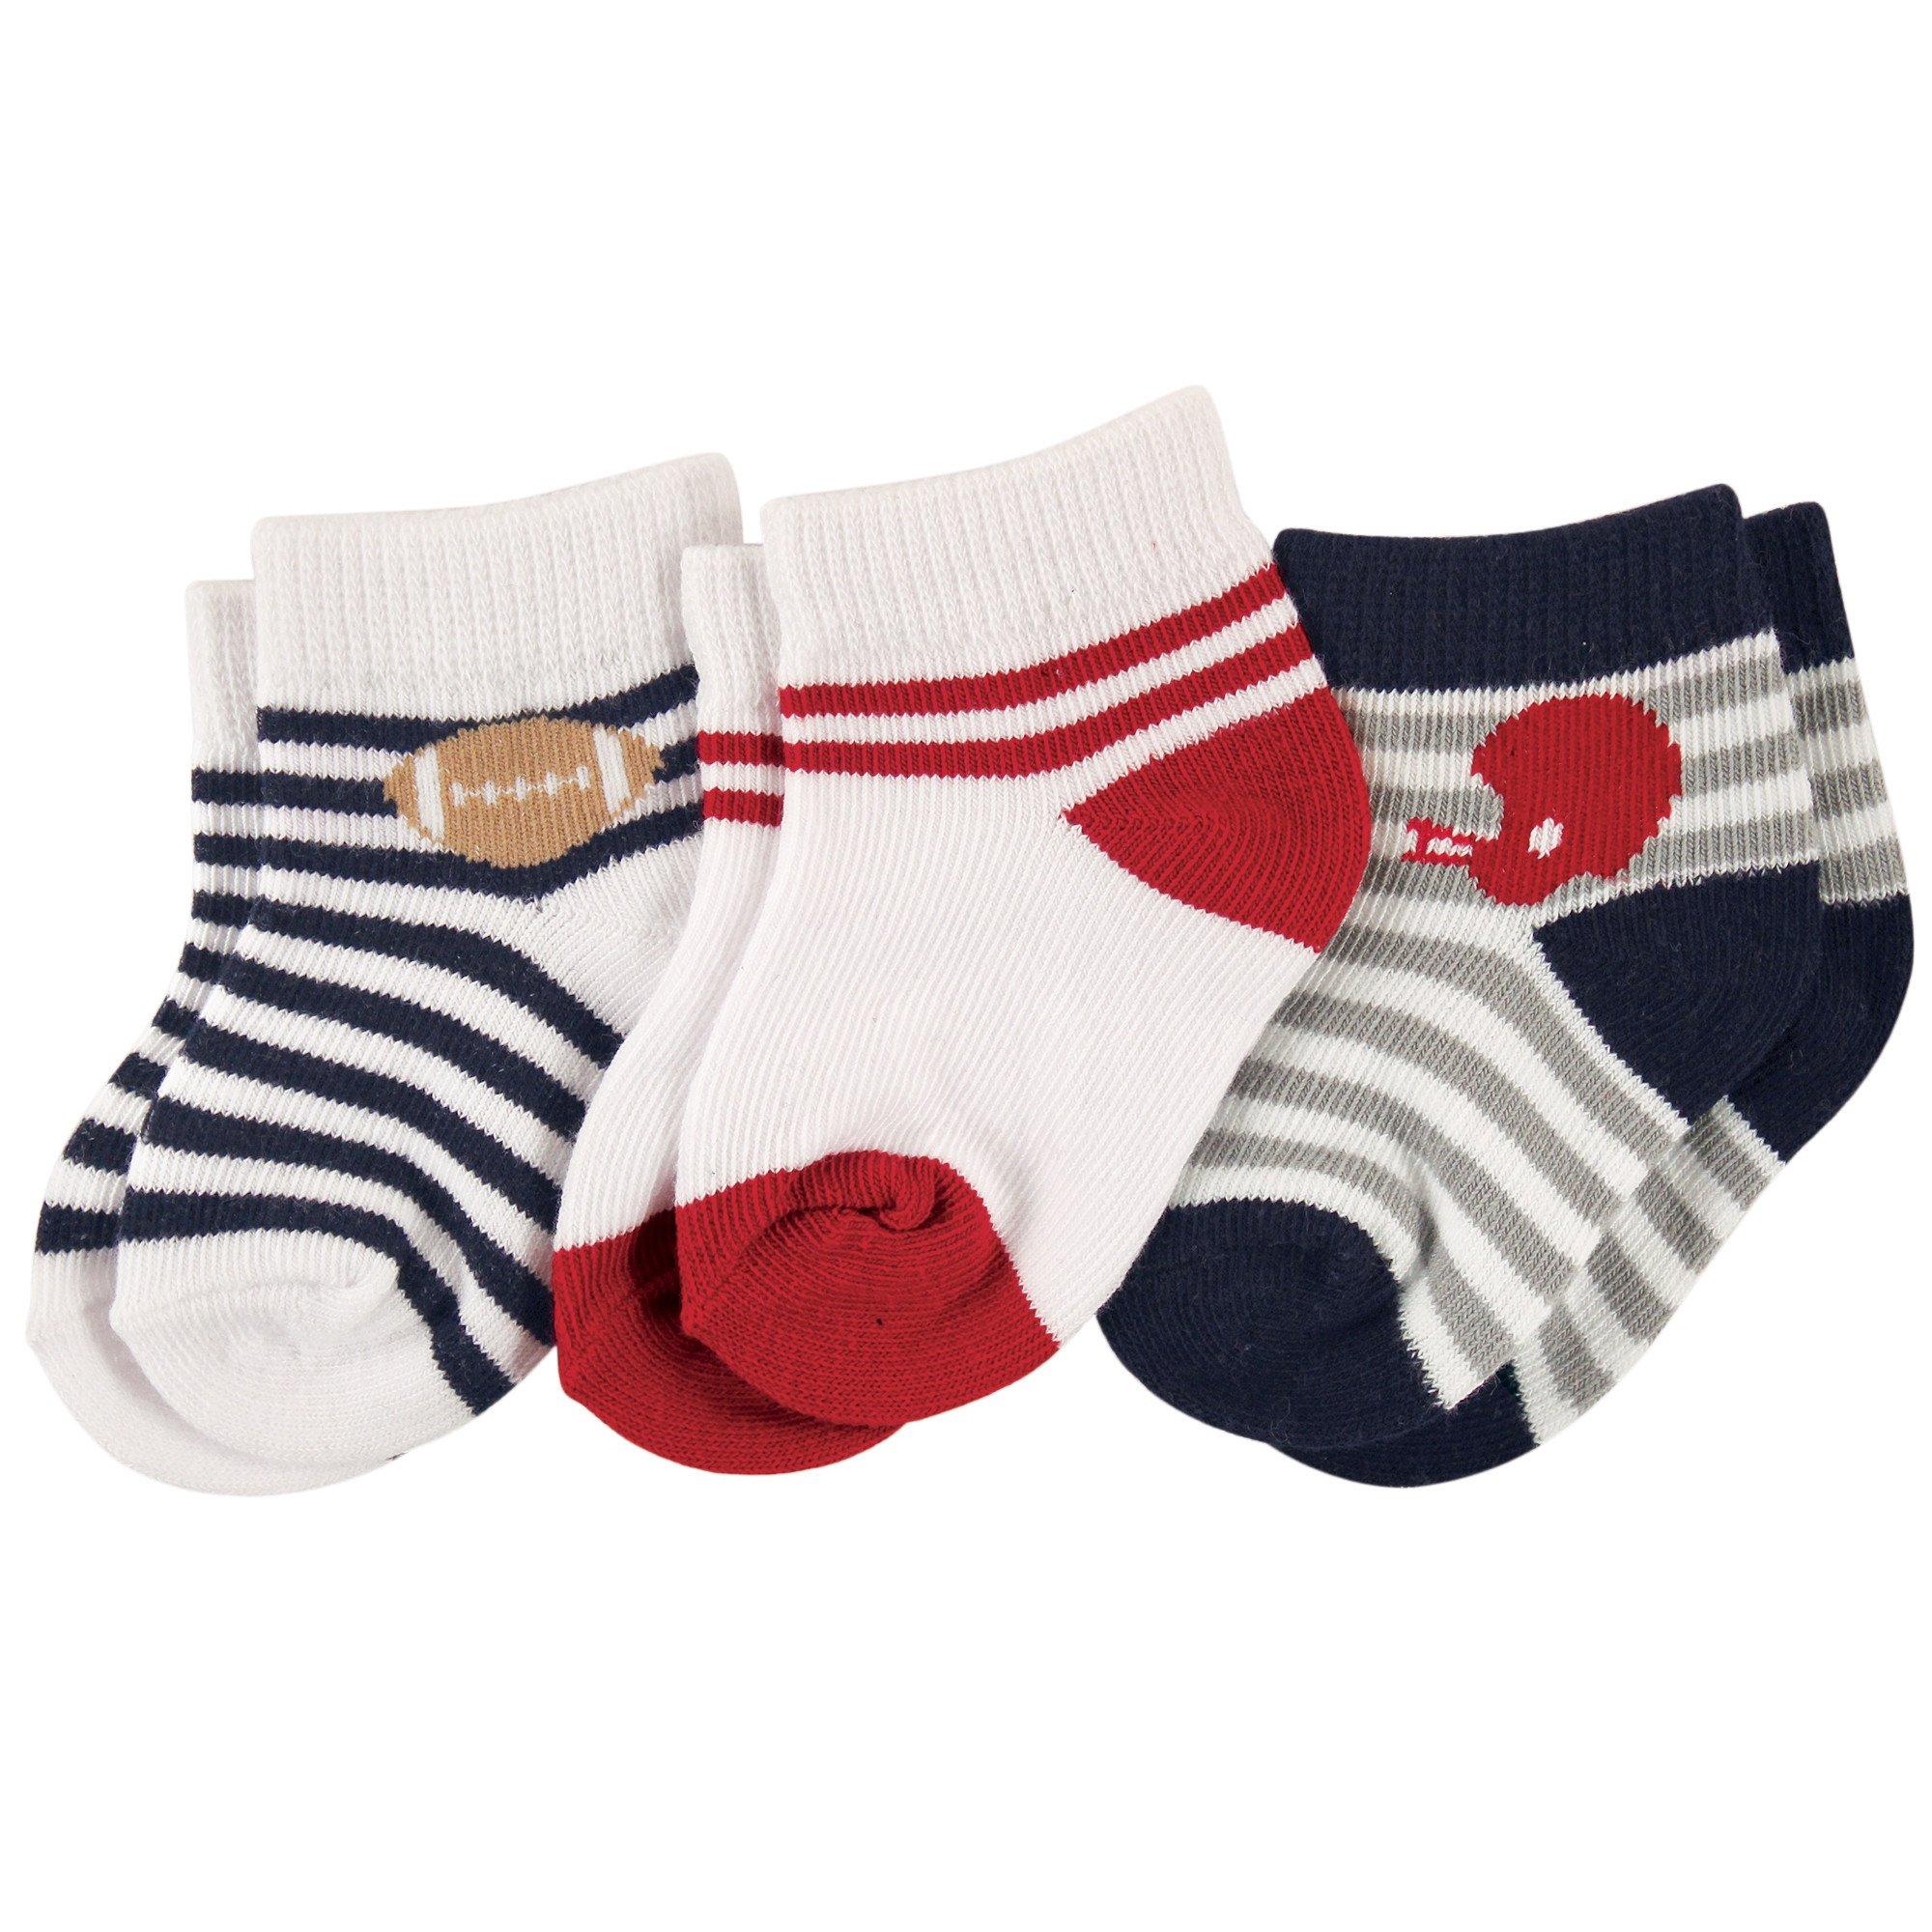 Luvable Friends Baby Basic Socks, Football